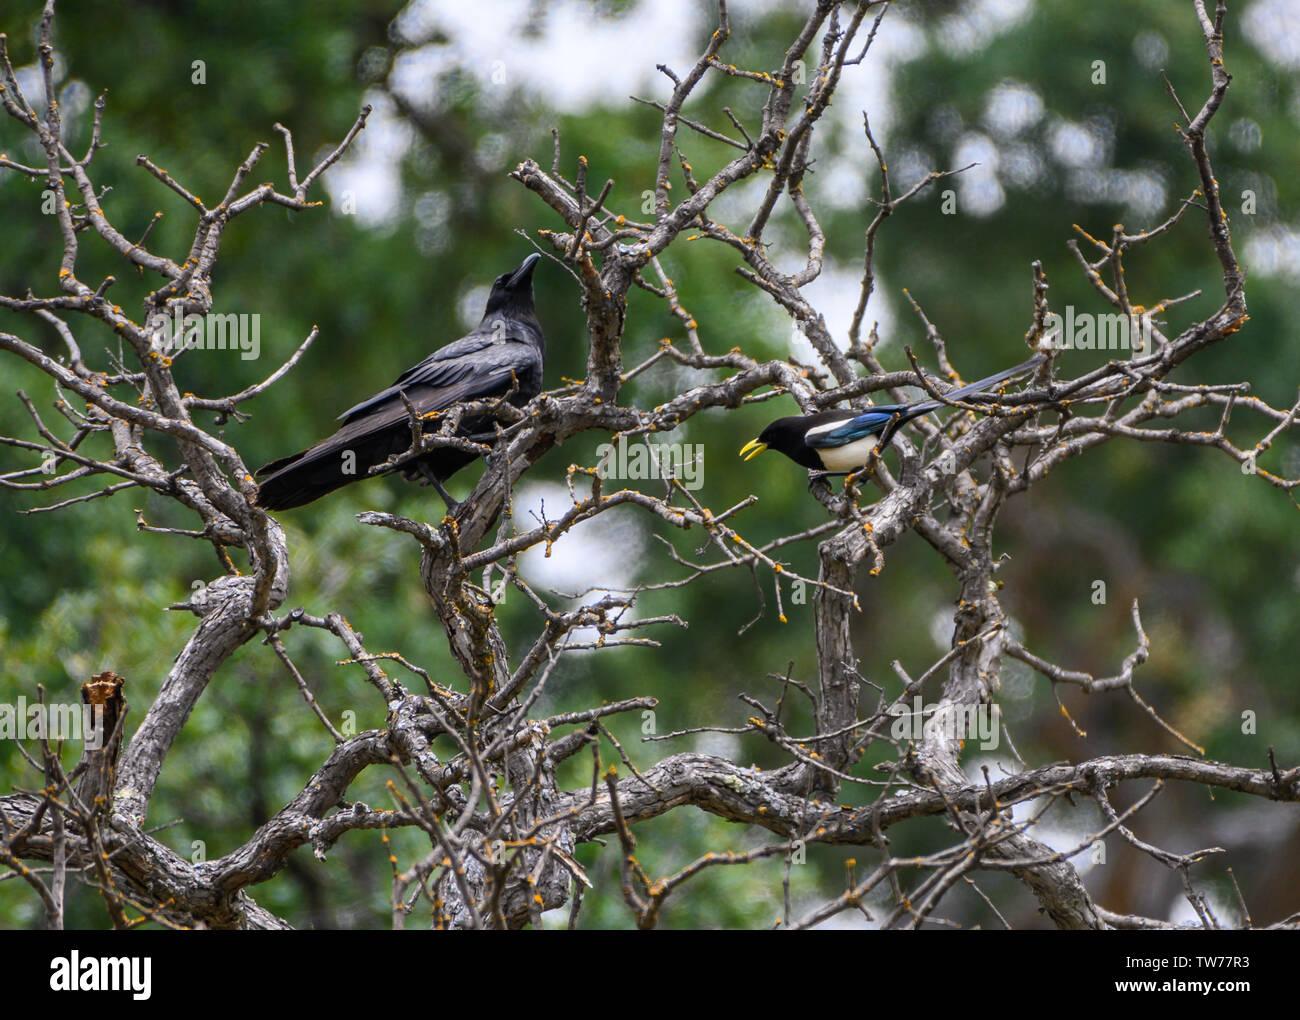 Una endémica de California amarillo-facturados Urraca (Pica nutalli) enfrenta un cuervo común (Corvus corax). California, EE.UU. Imagen De Stock